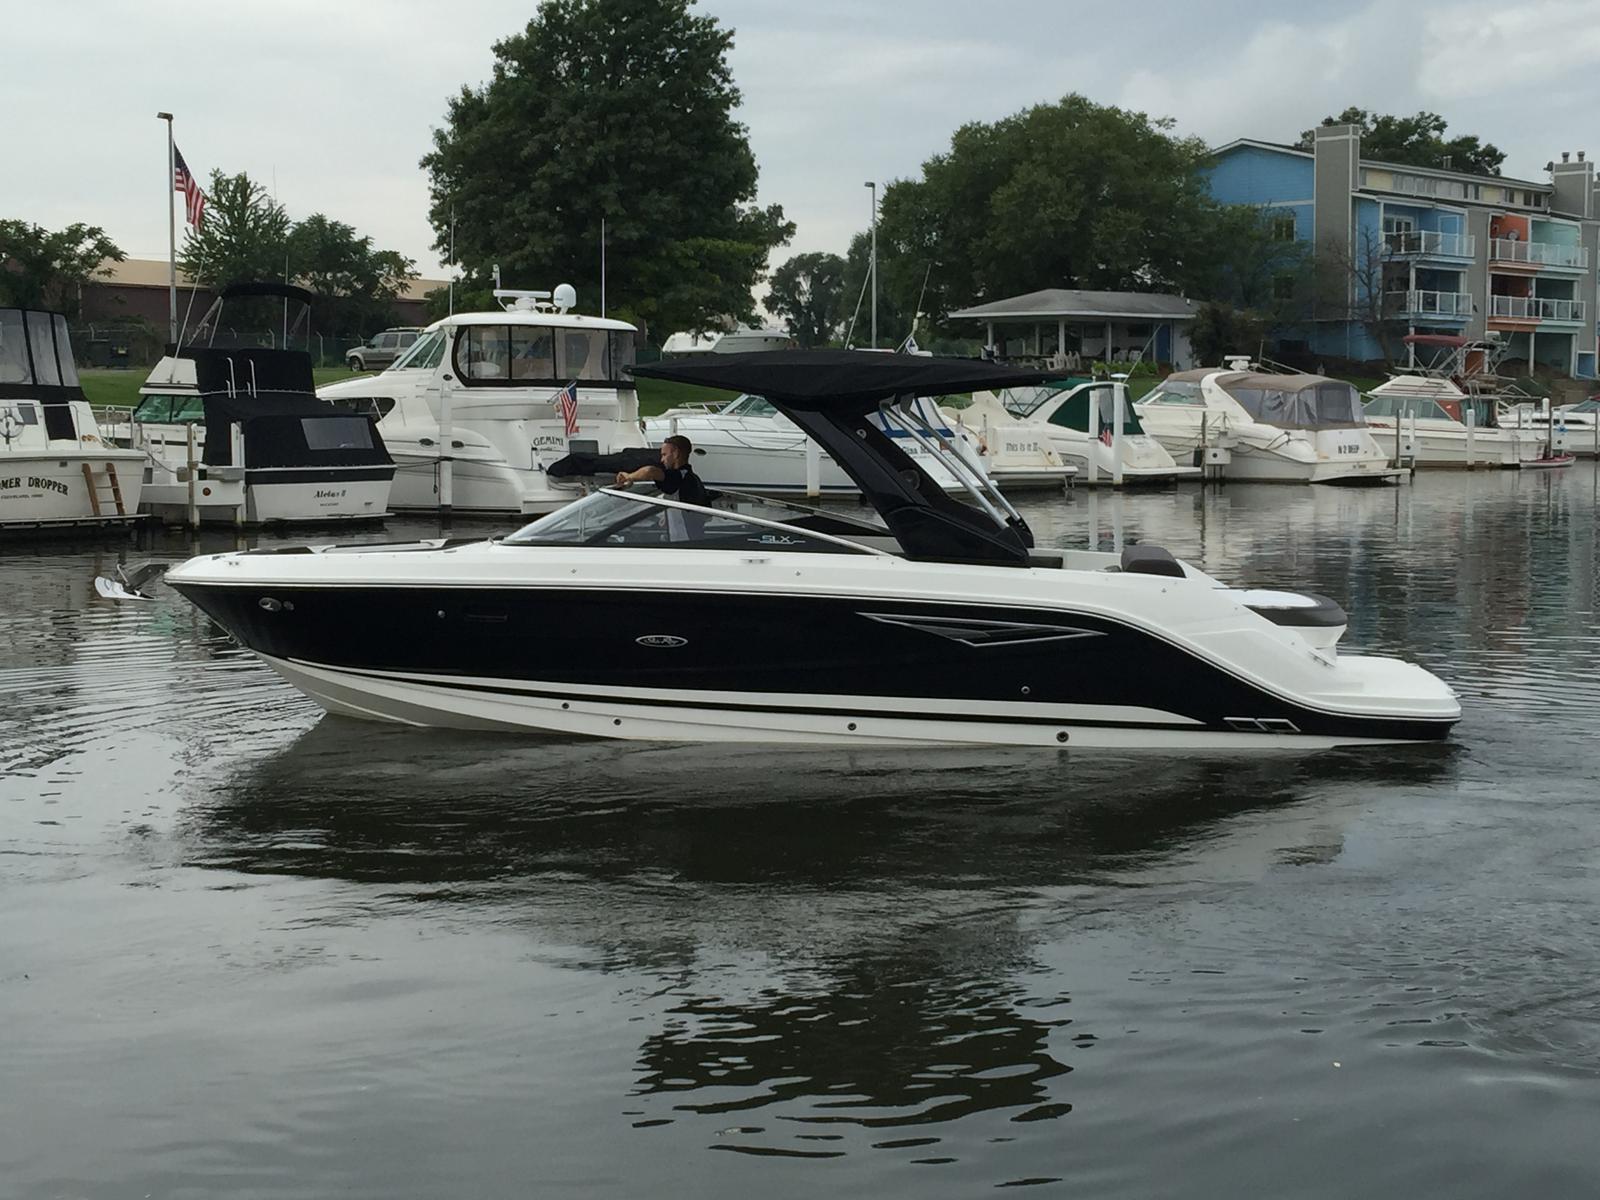 2017 SEA RAY 280 SLX for sale